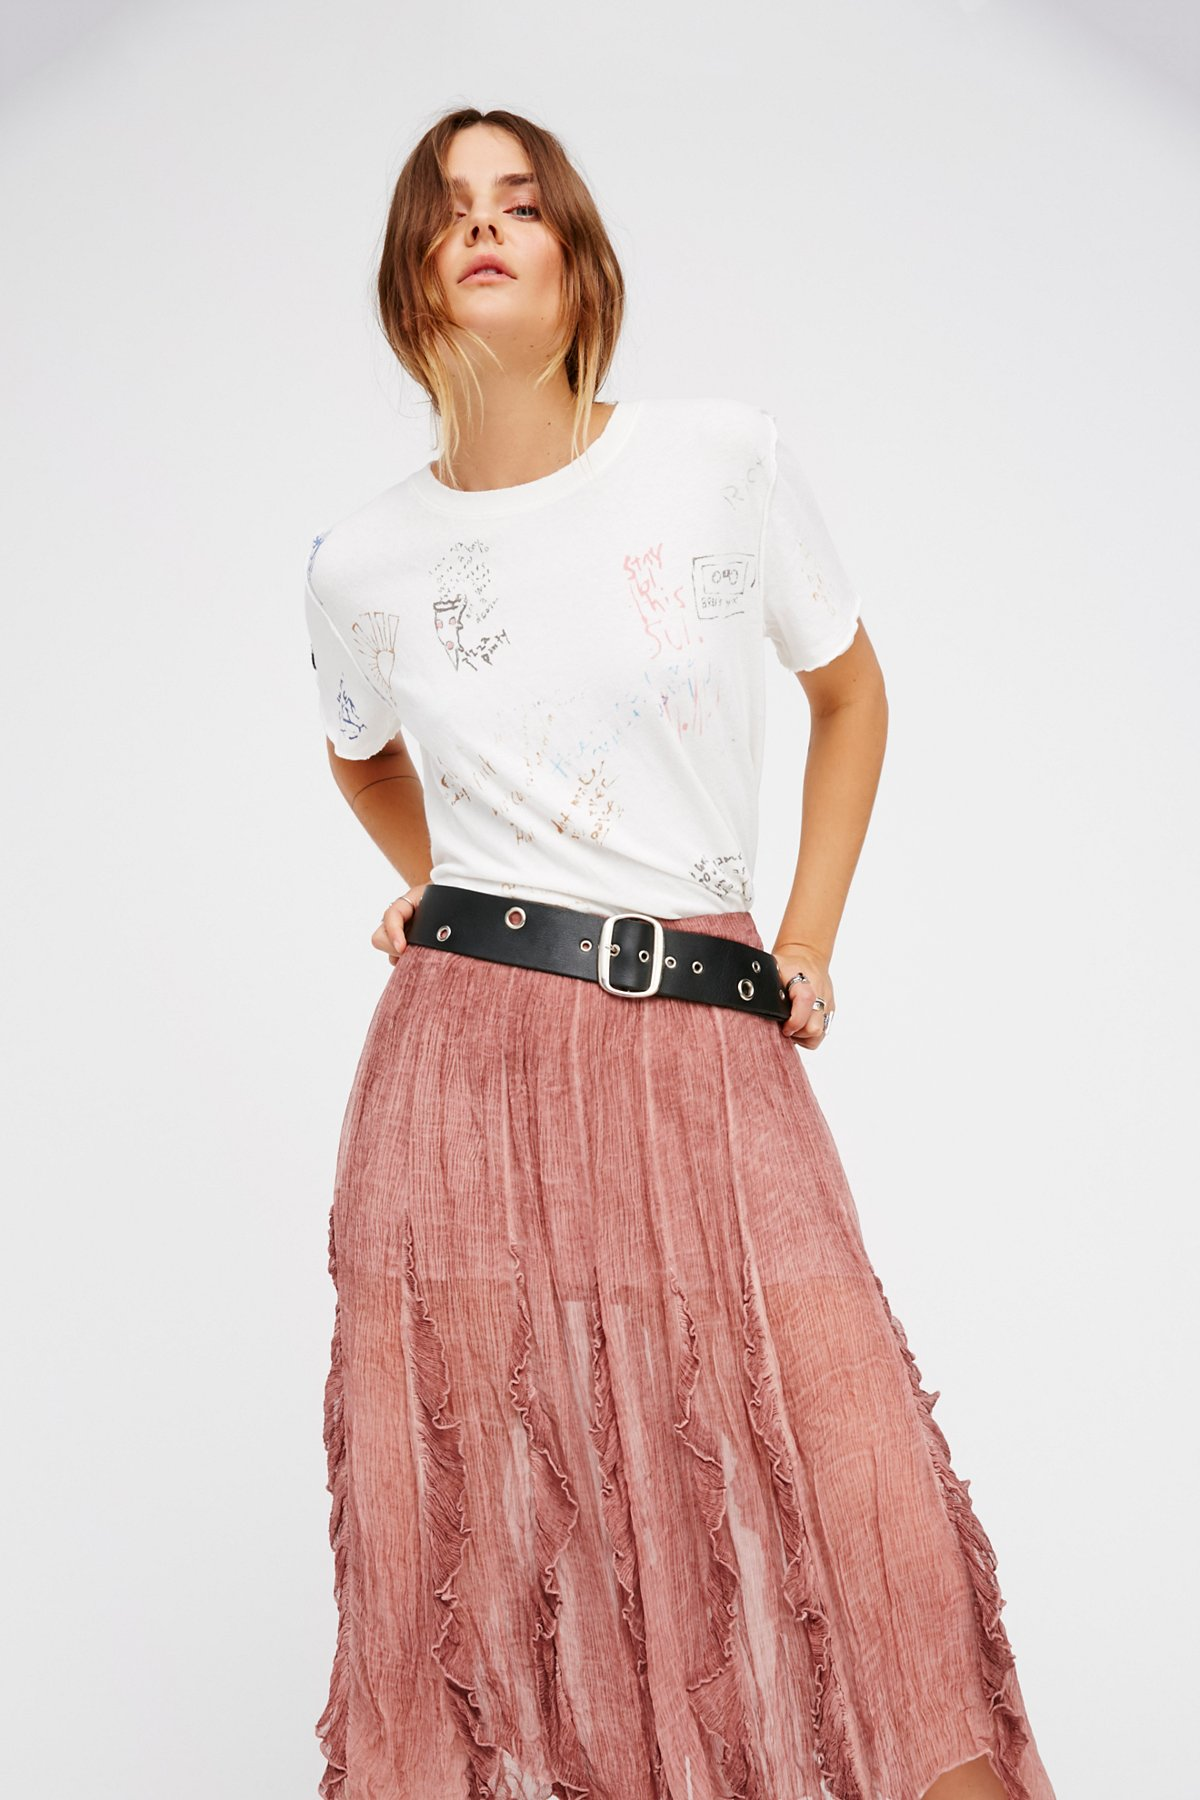 Follow Me Ruffle Skirt